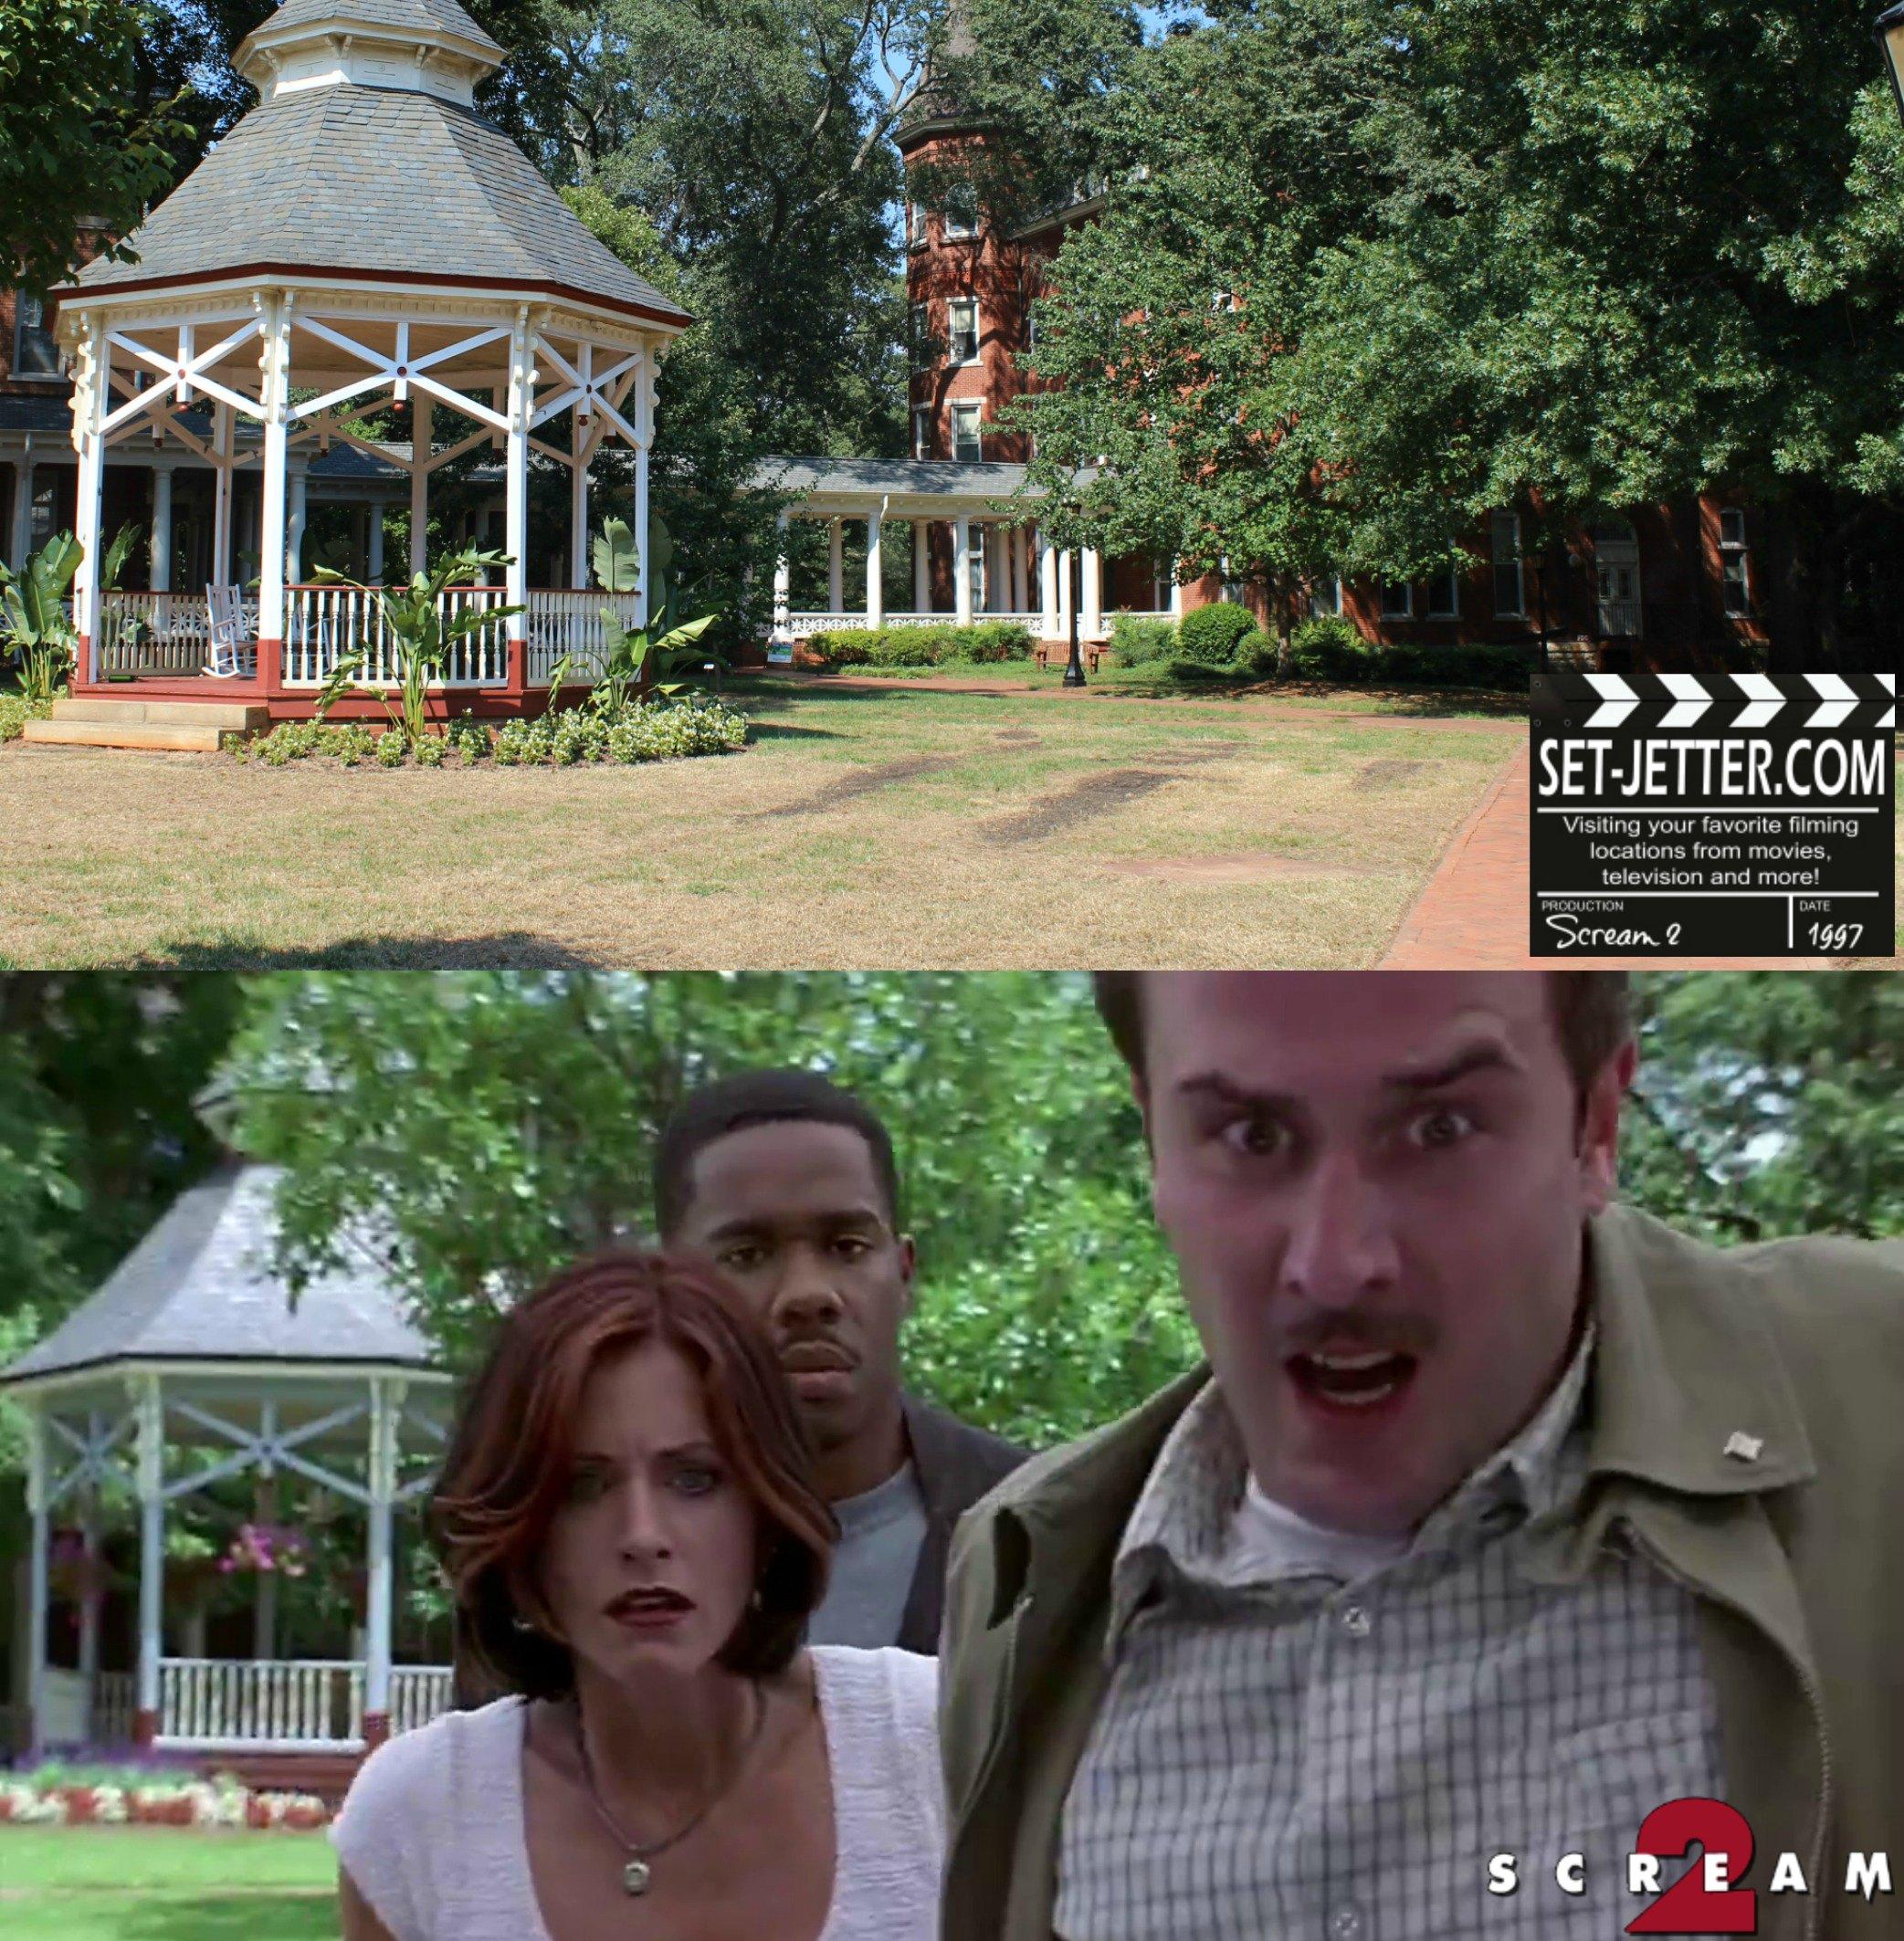 Scream 2 comparison 174.jpg